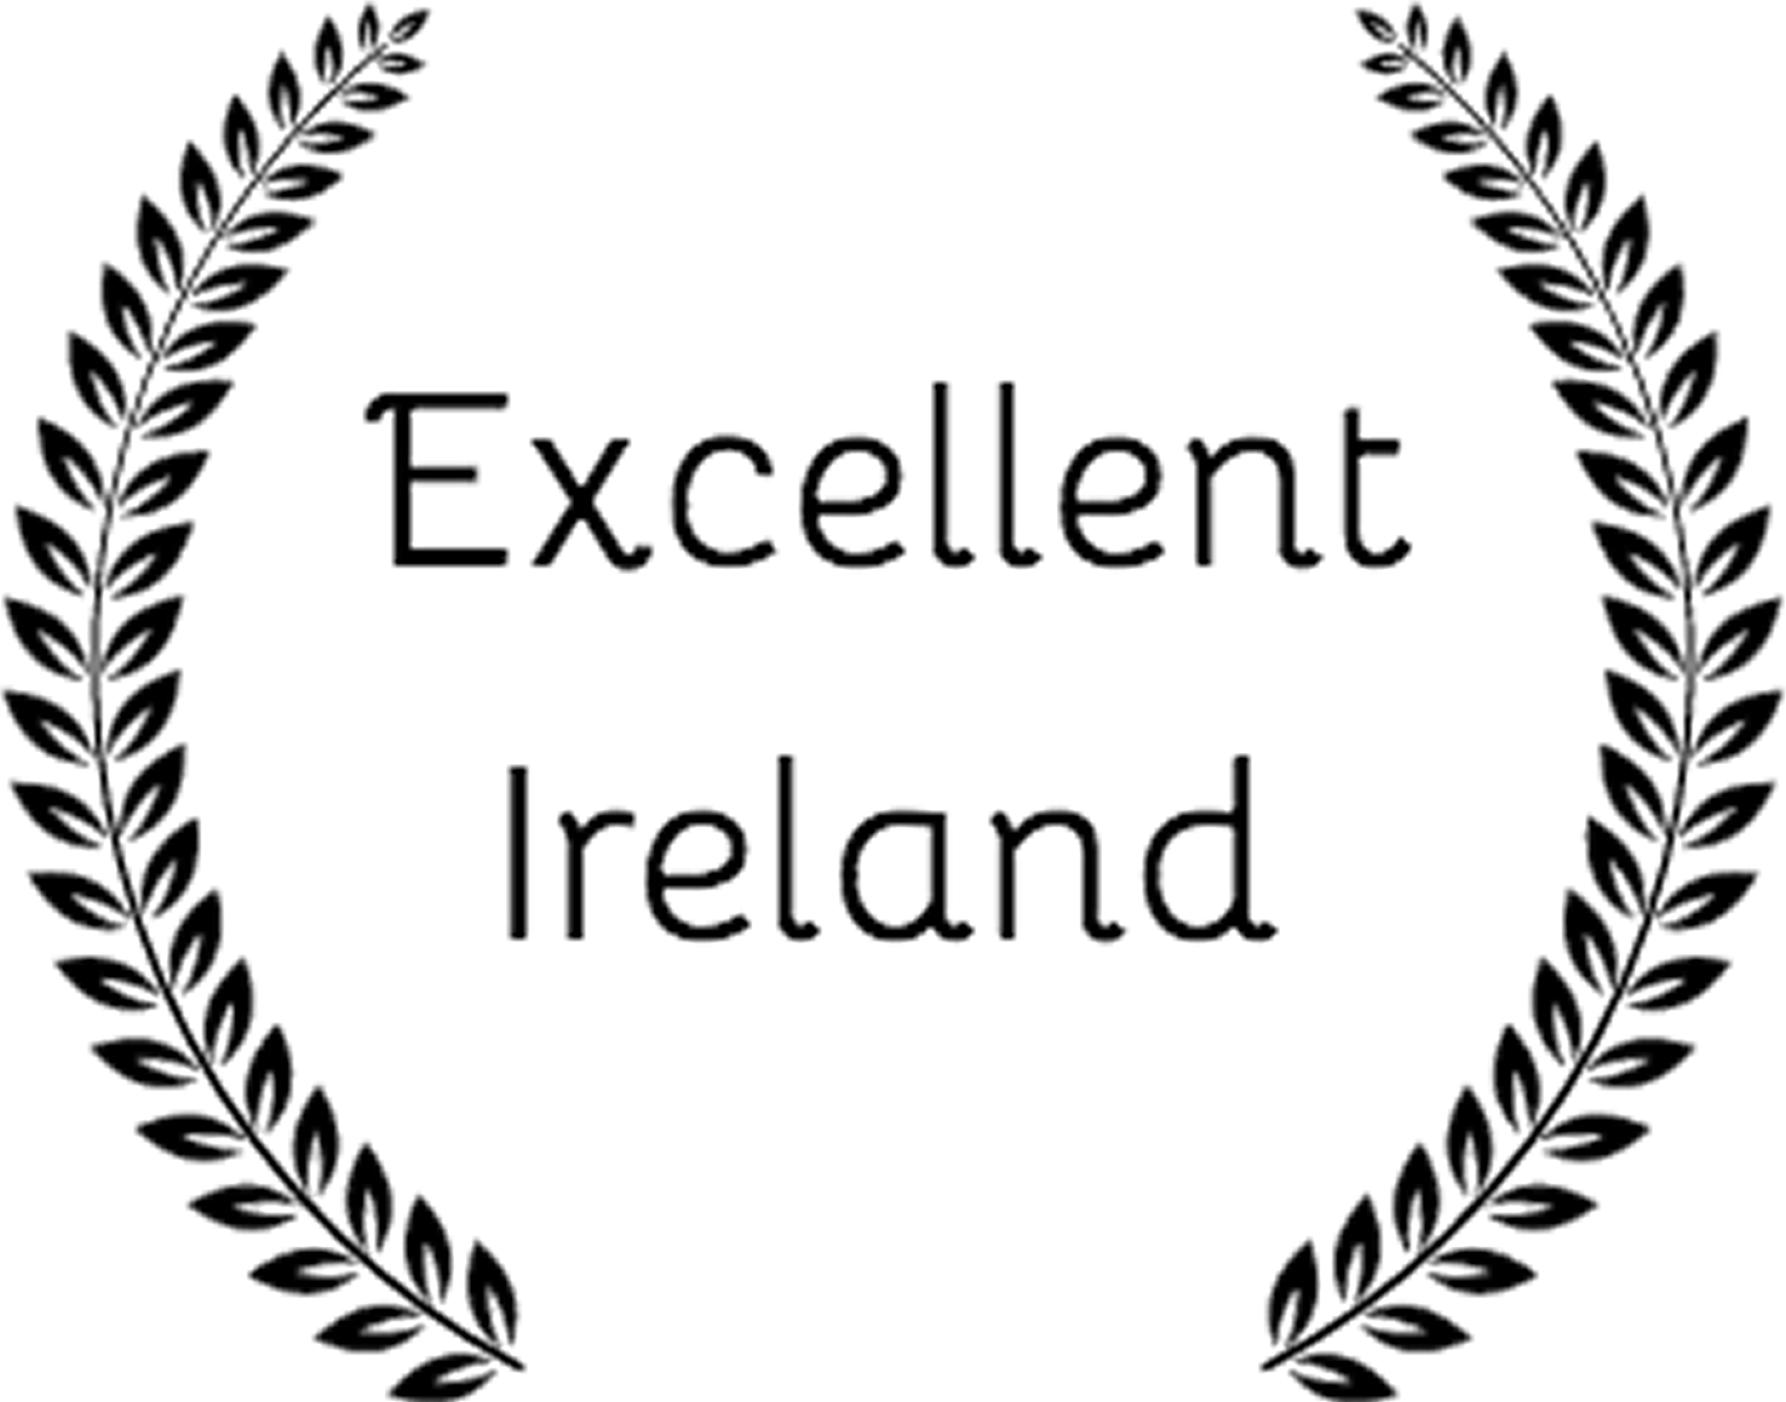 Excellent Ireland